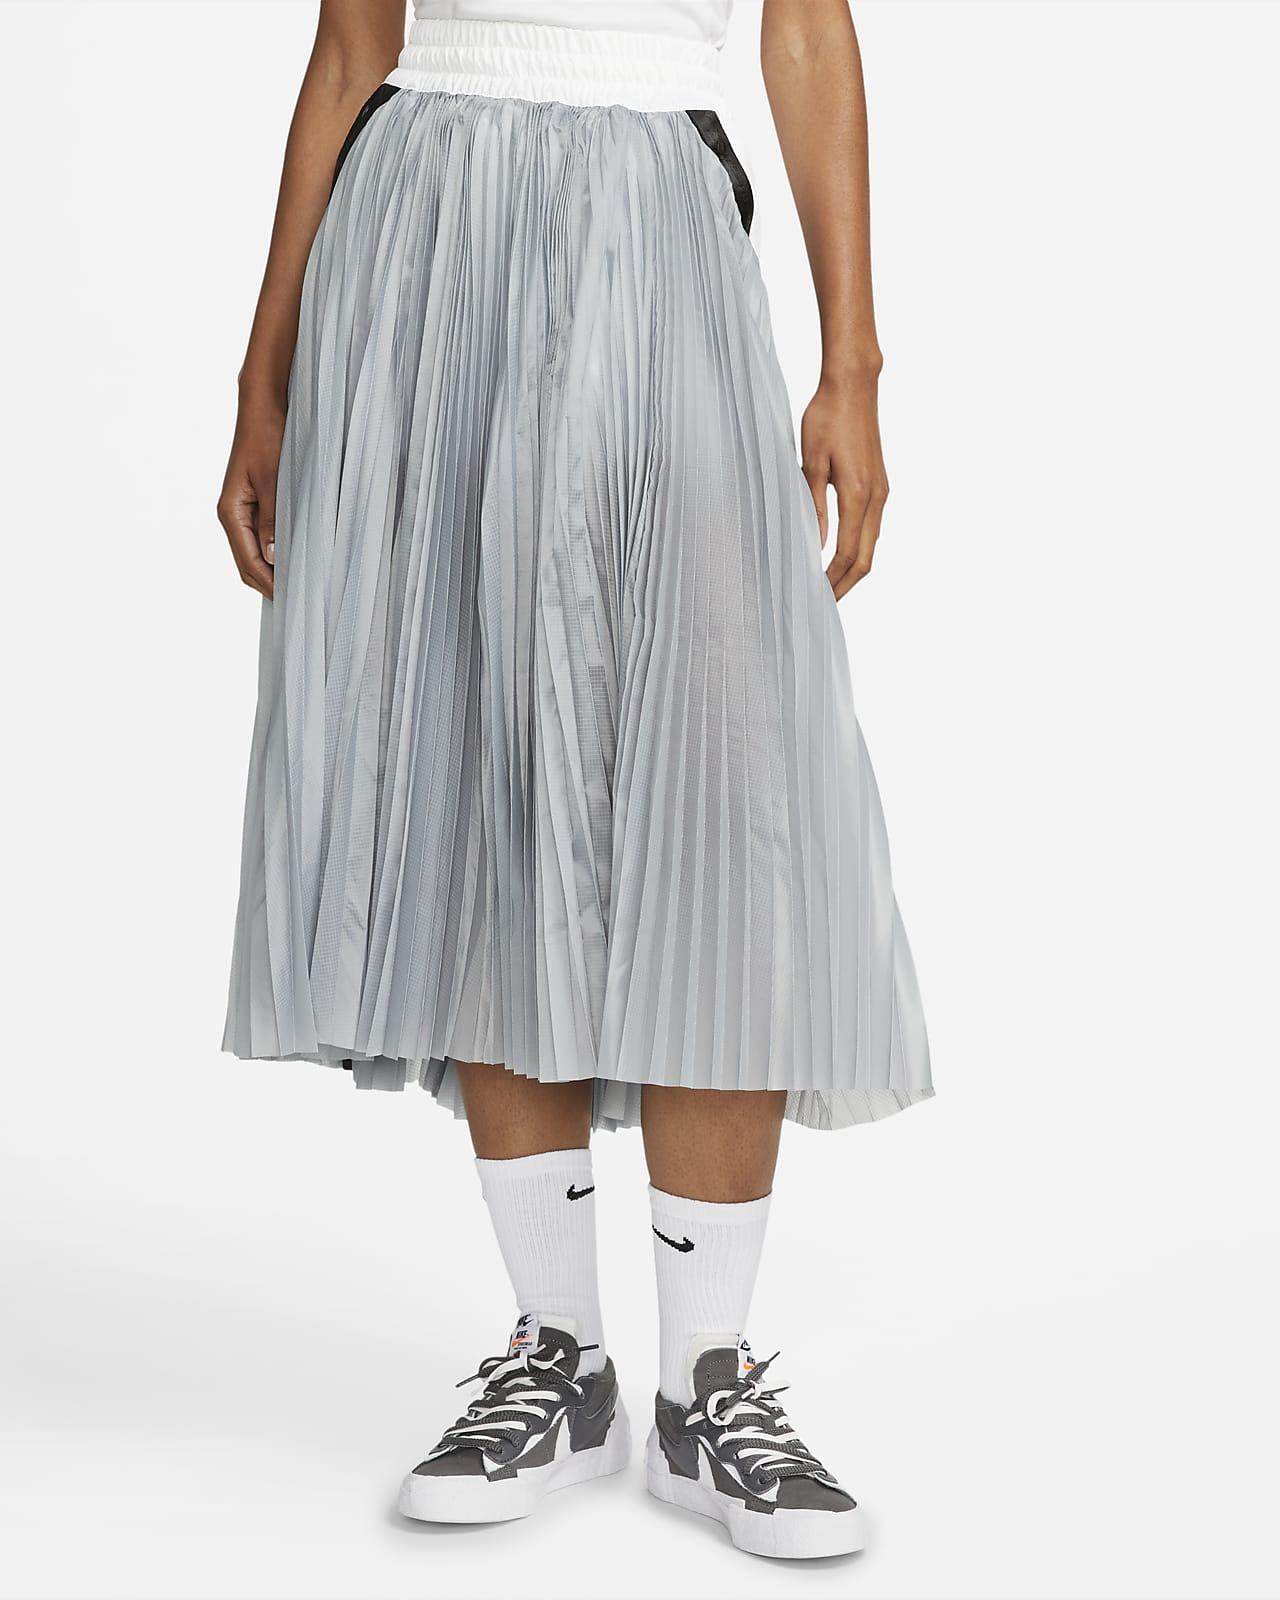 Nike x sacai Women's Skirt